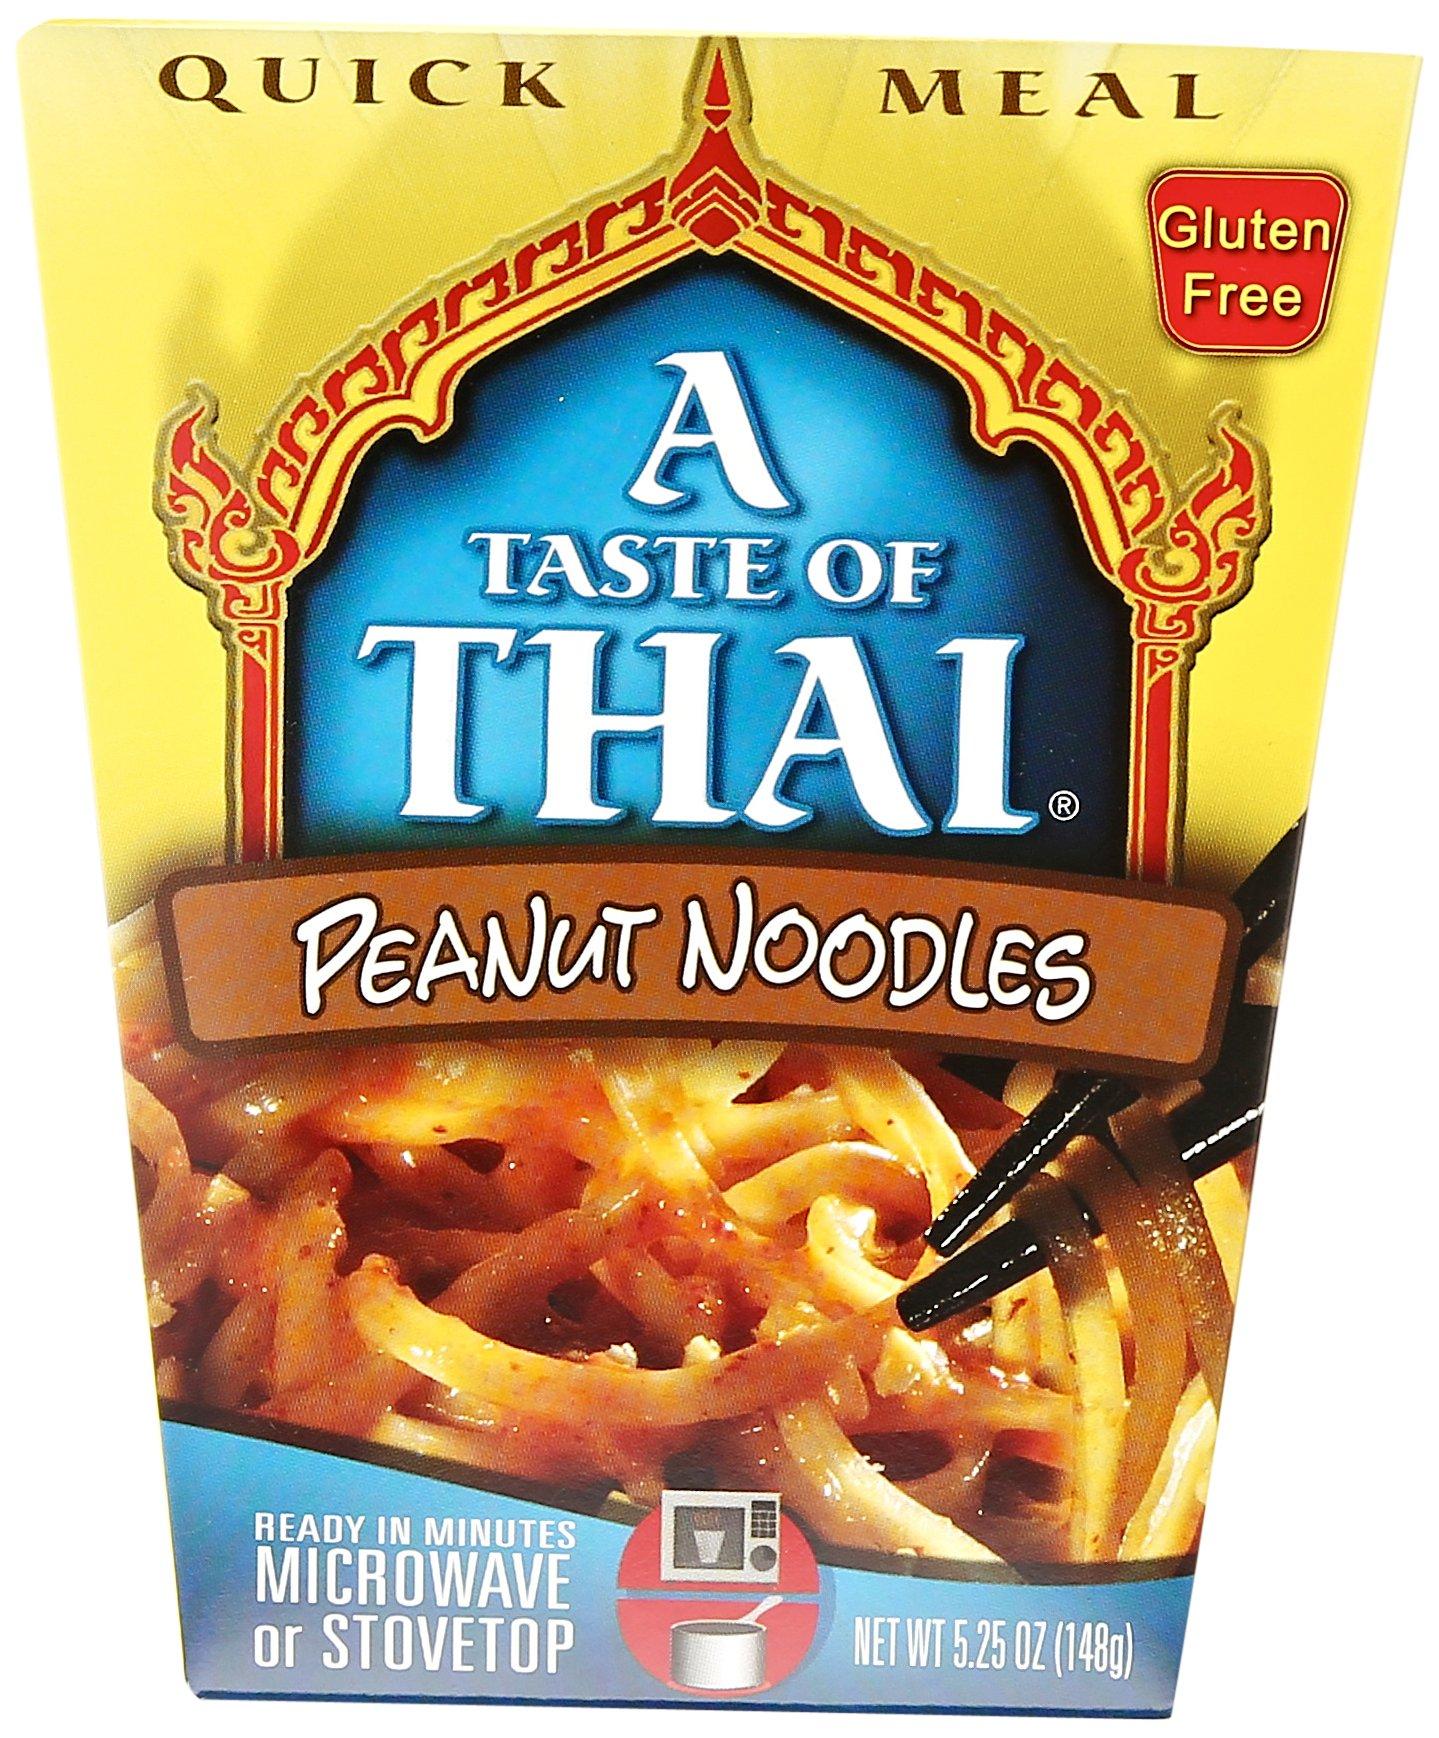 Taste Of Thai Peanut Noodles Quick Meal, 5.25 oz